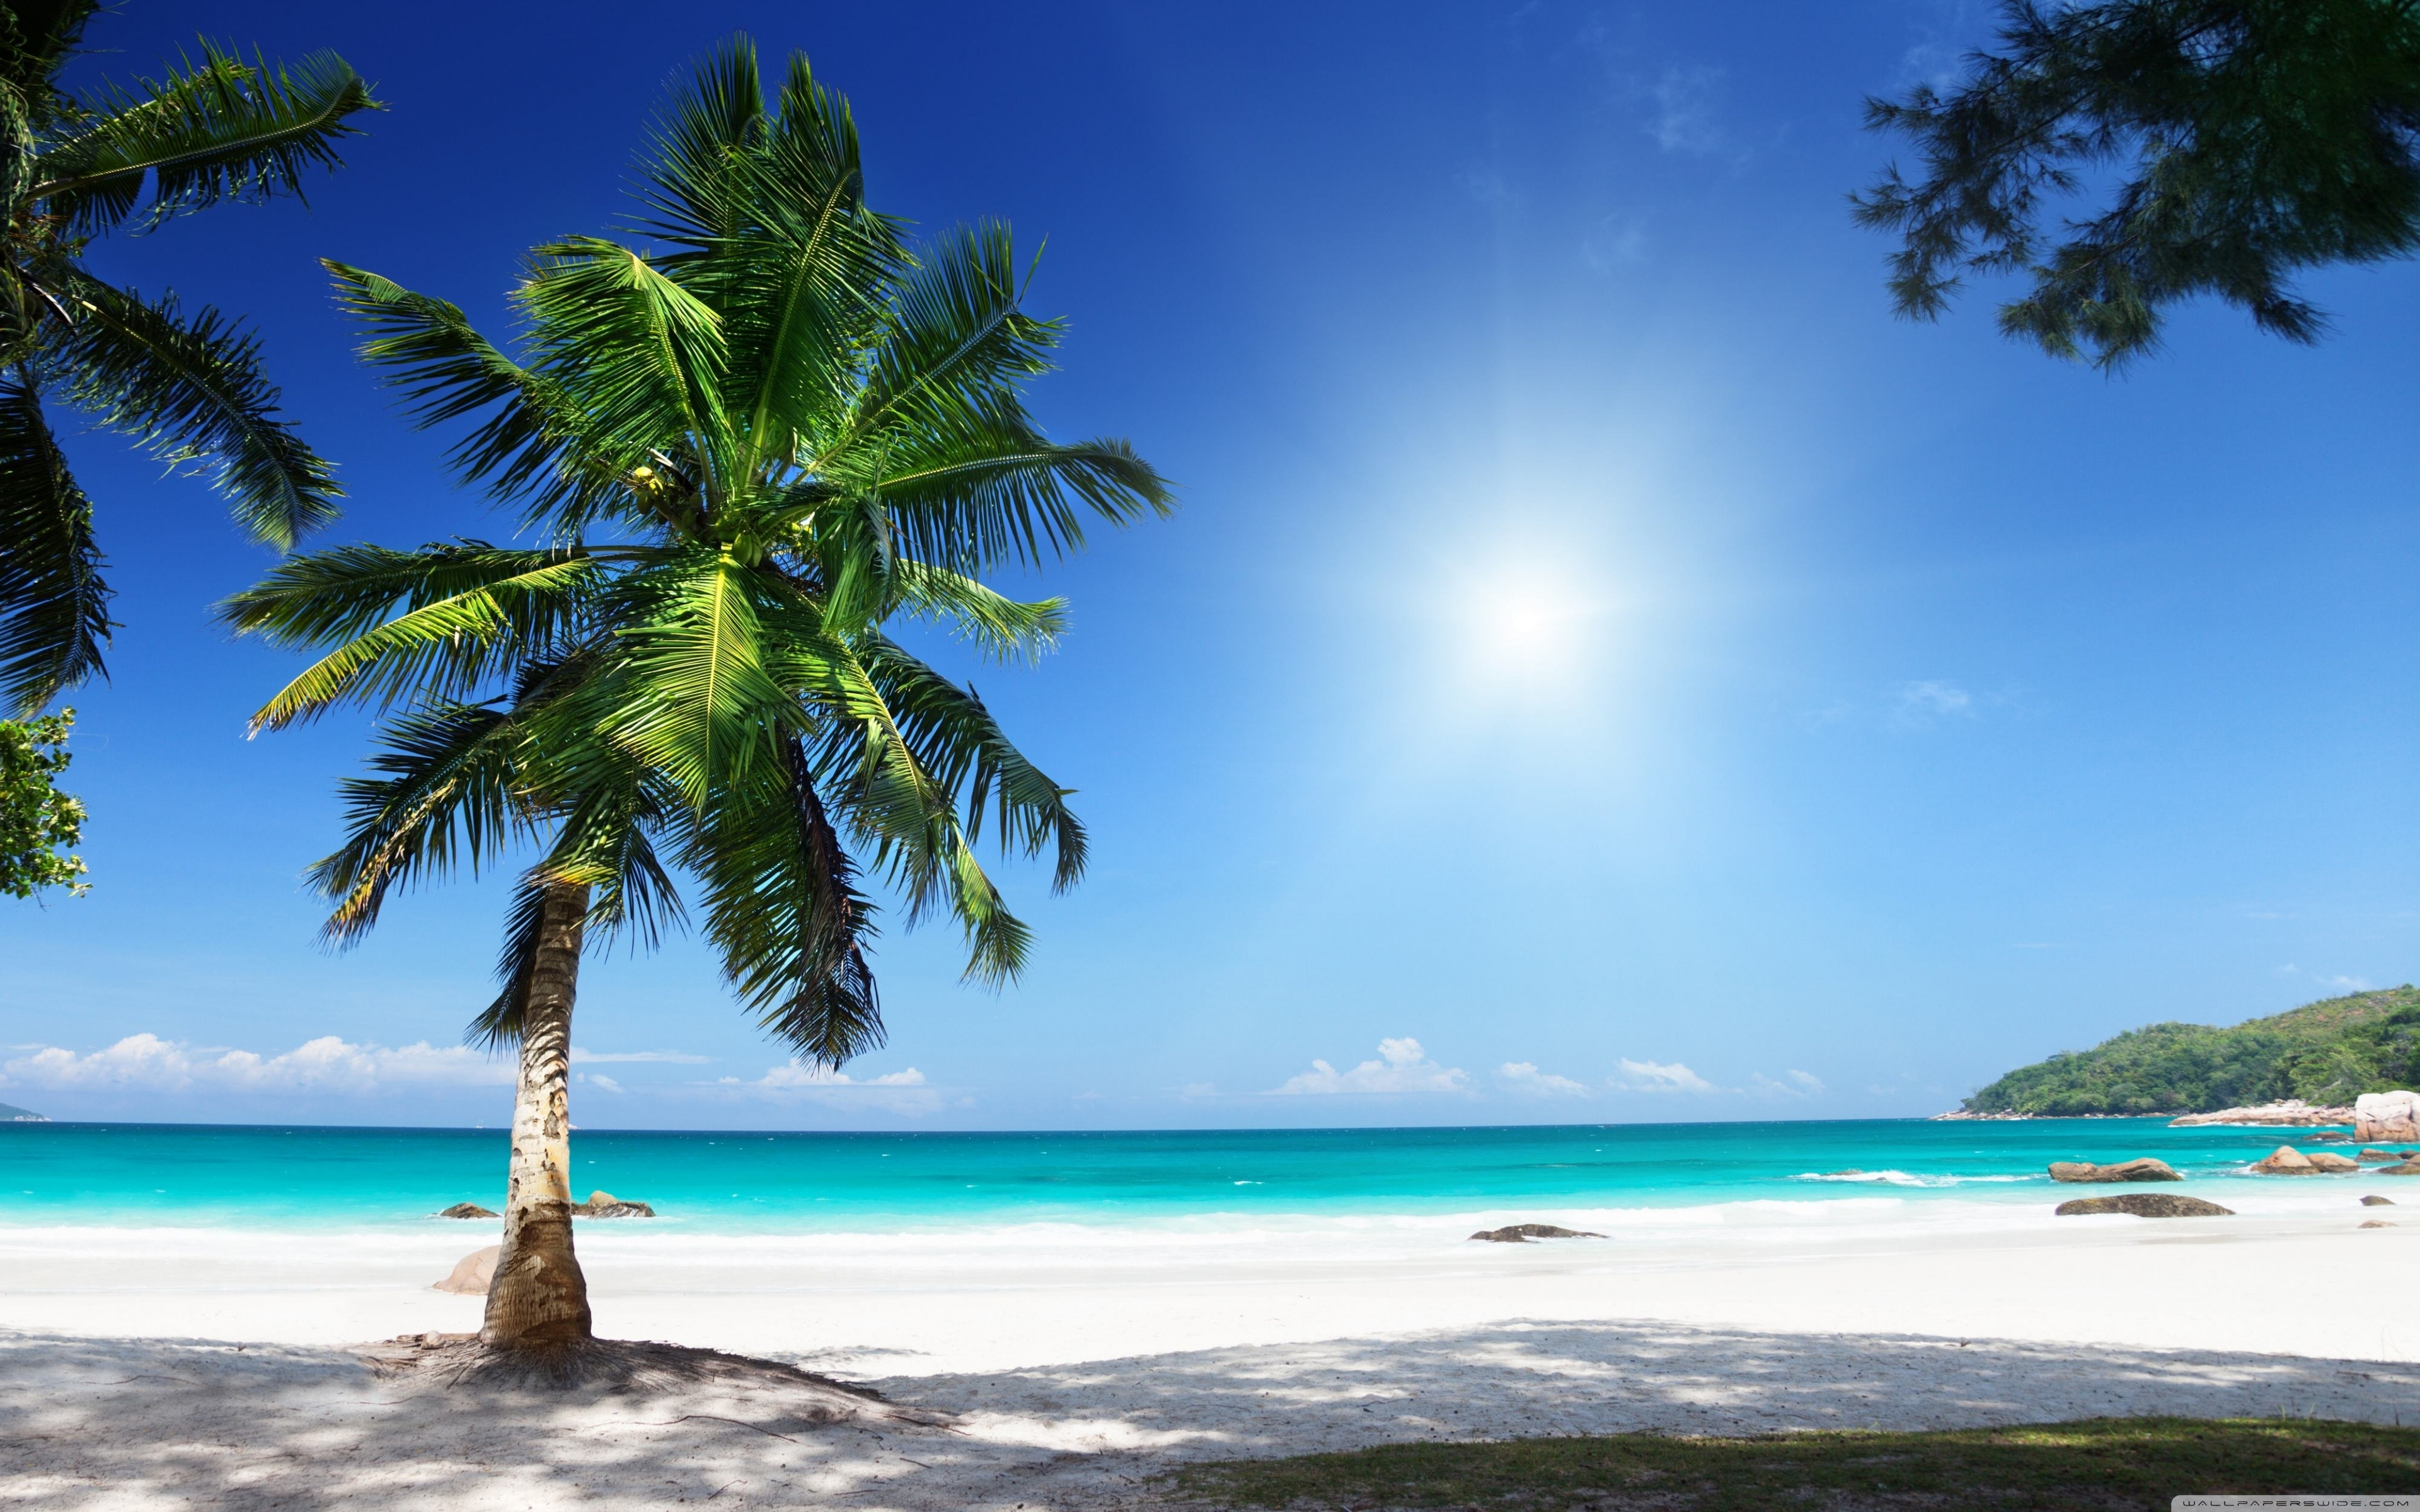 sunny beach ❤ 4k hd desktop wallpaper for 4k ultra hd tv • tablet